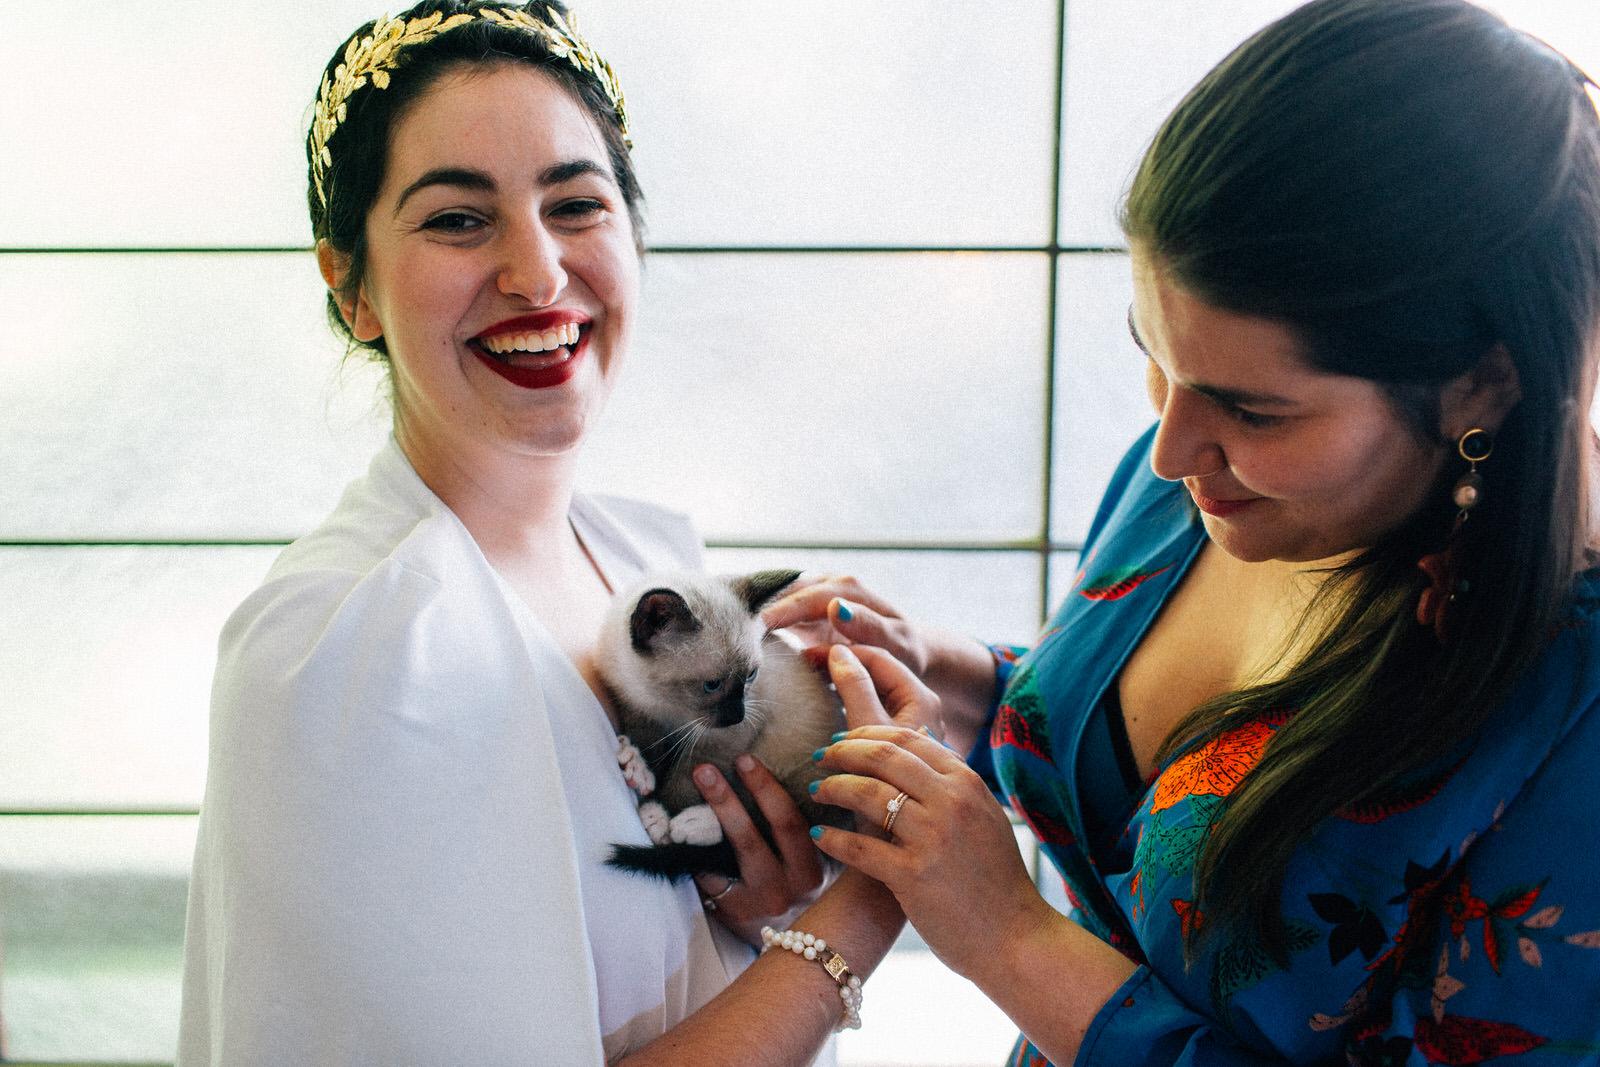 colleen iz quaker meeting house seattle washington feminist wedding kitten hour flower crowns indoor ceremony kendall lauren shea fuck yeah weddings